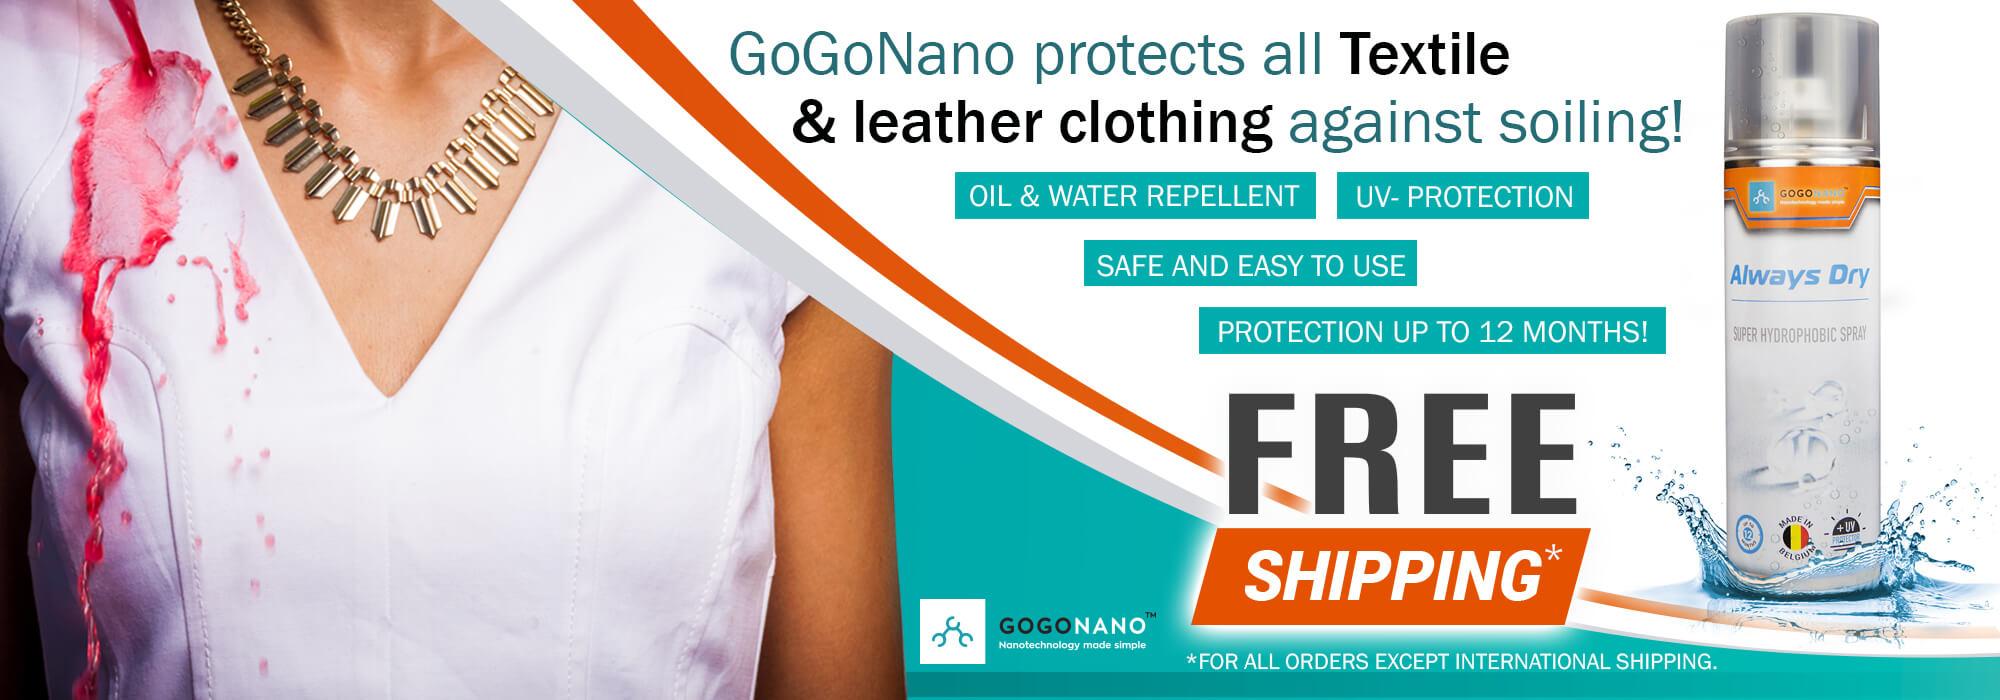 Superhydrophobic-nano-protection-gogonano-always-dry